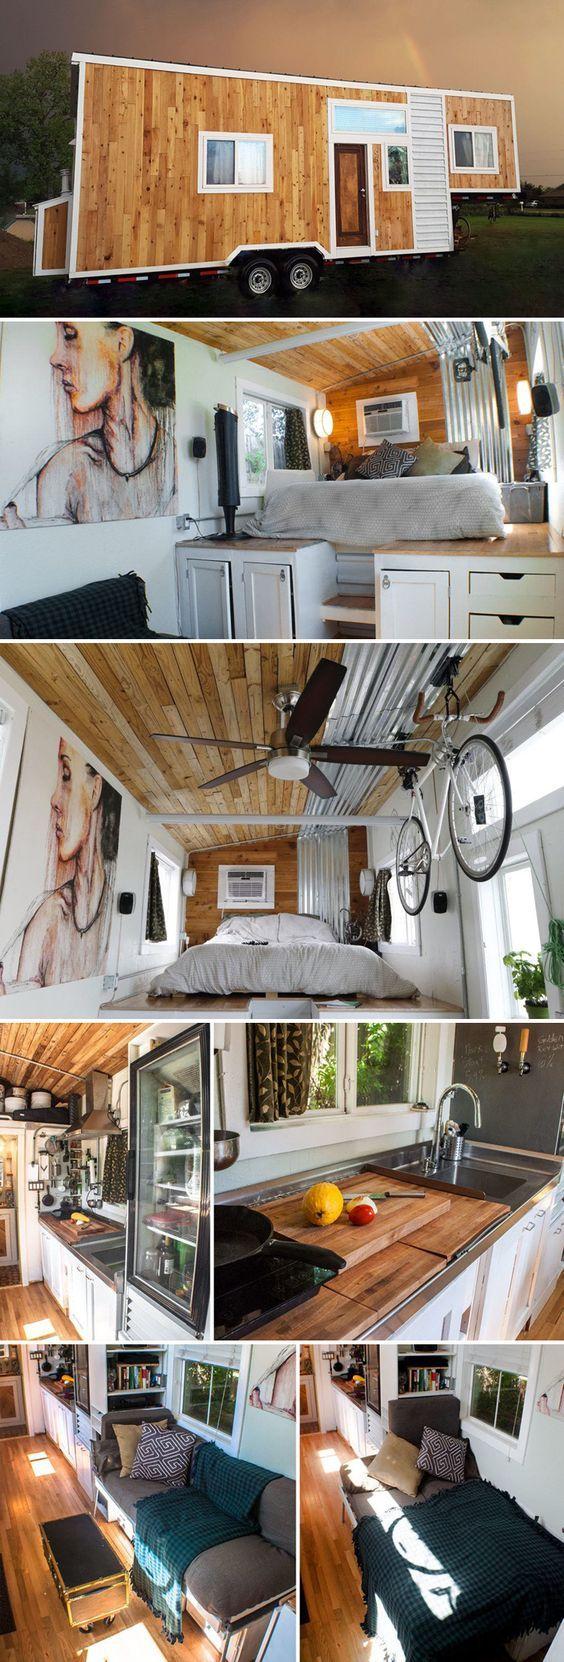 Terraform One by Terraform Tiny Homes | Wohnwagen